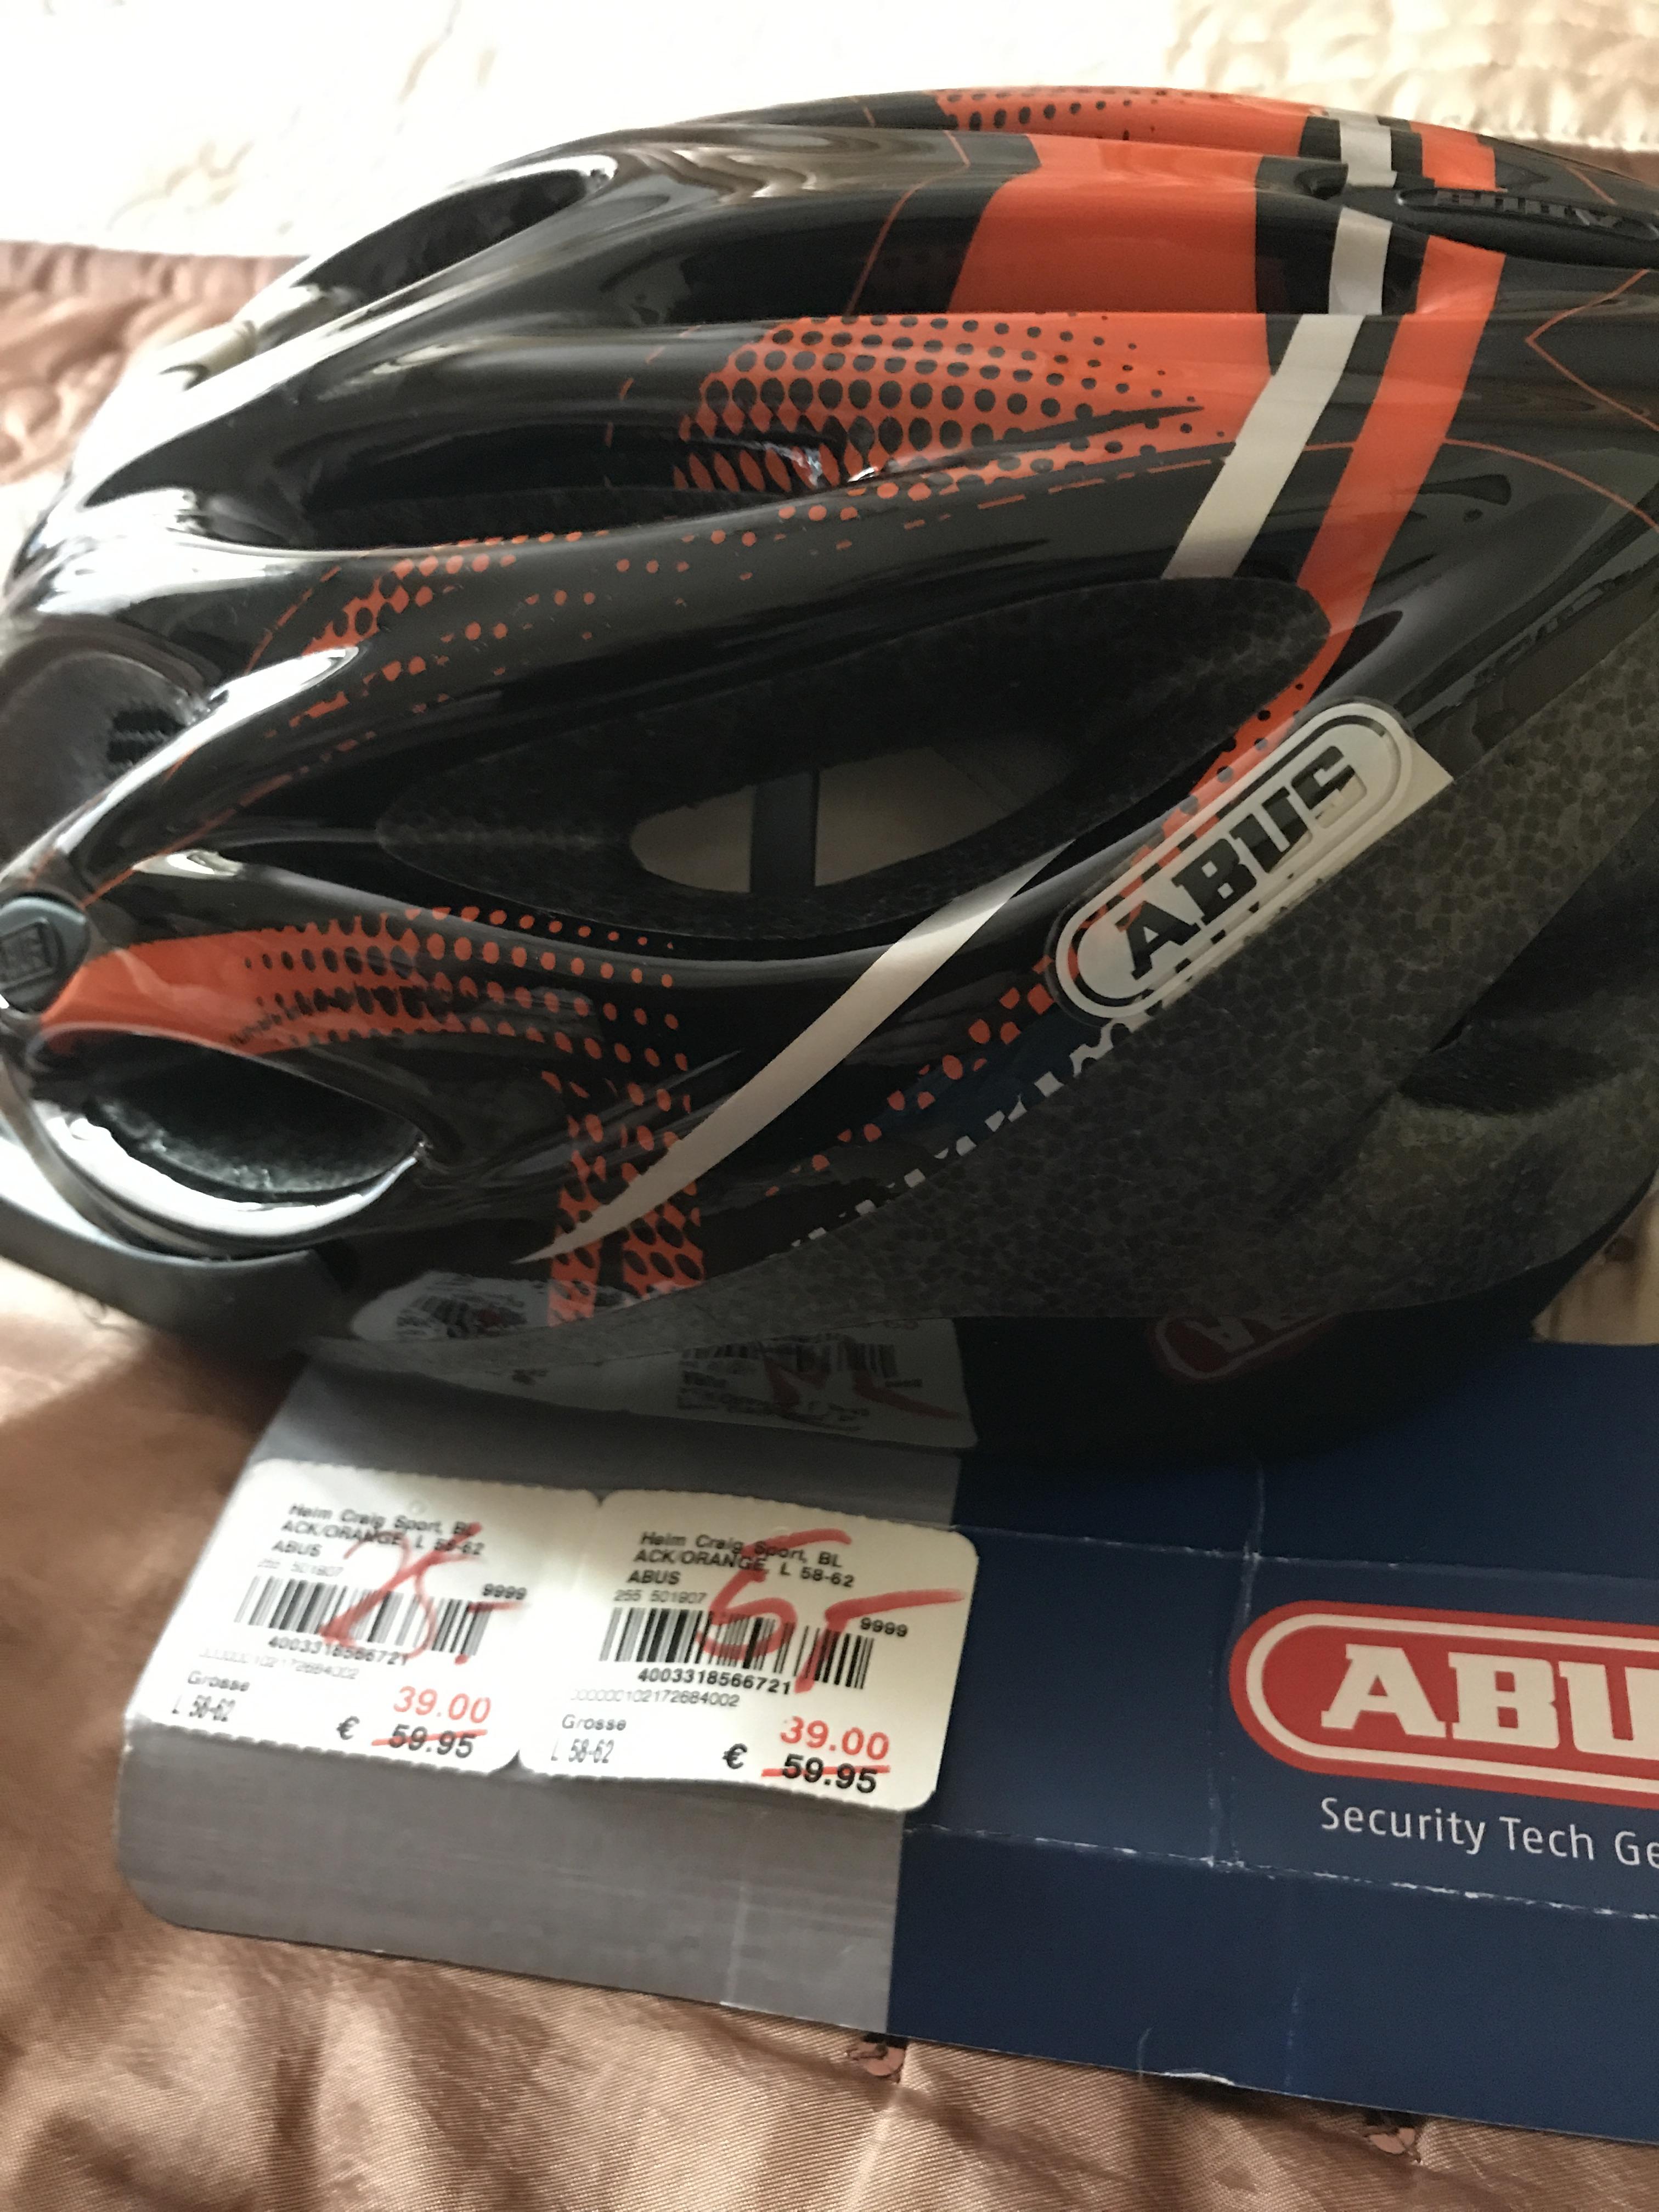 Abus Craig Fahrradhelm für 3,75€ statt 59,95€ Karstadt Sport Hanau